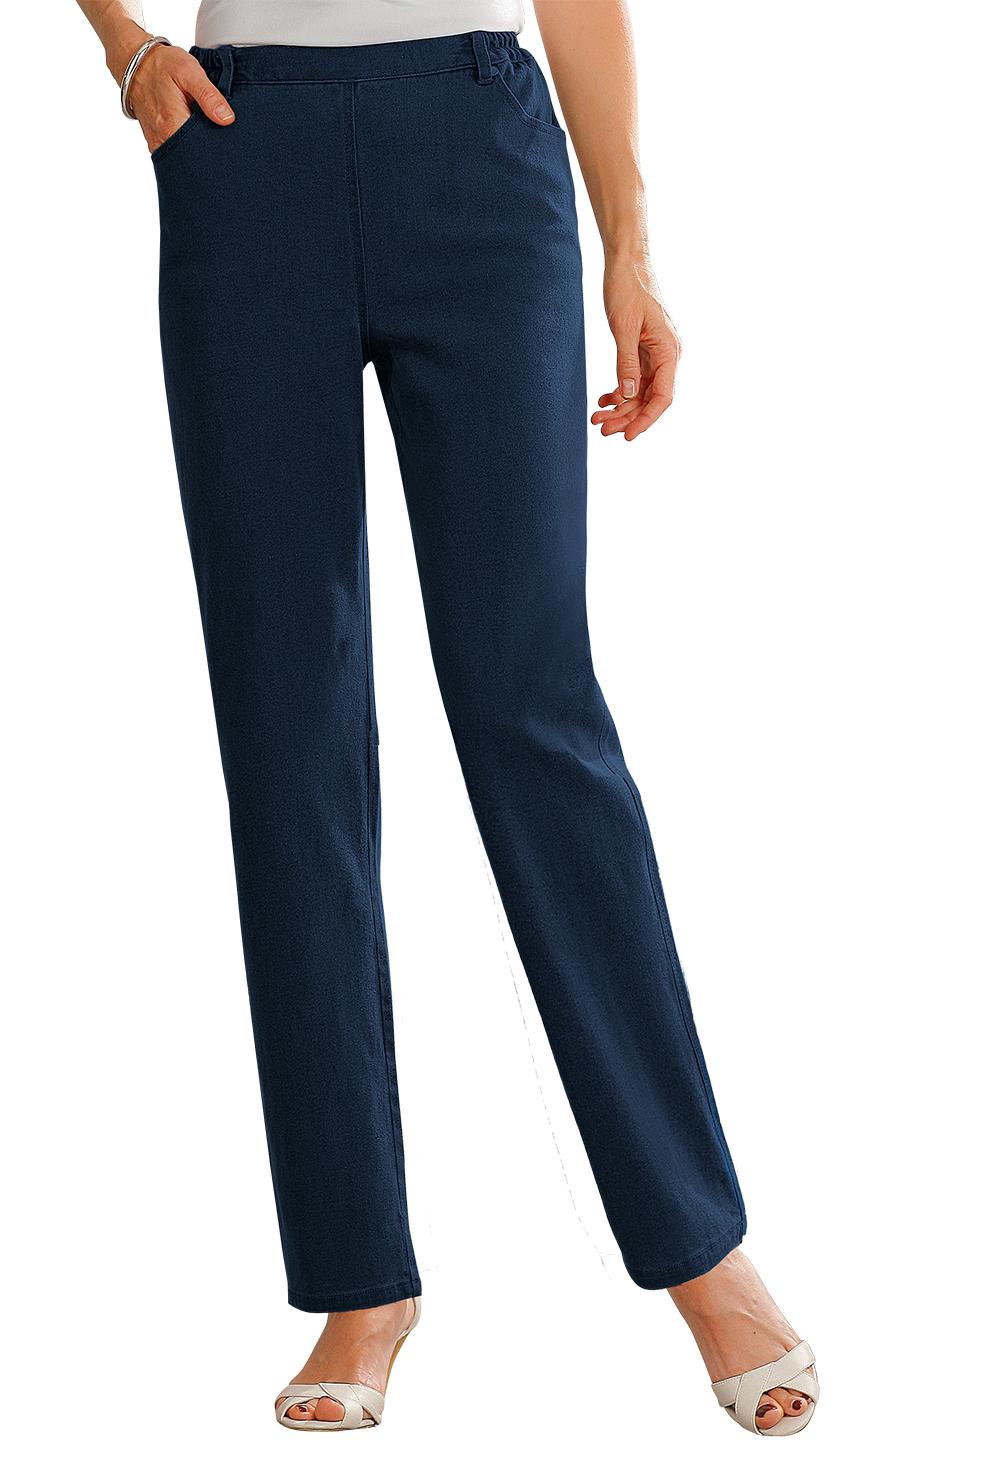 pantalon femme ventre plat